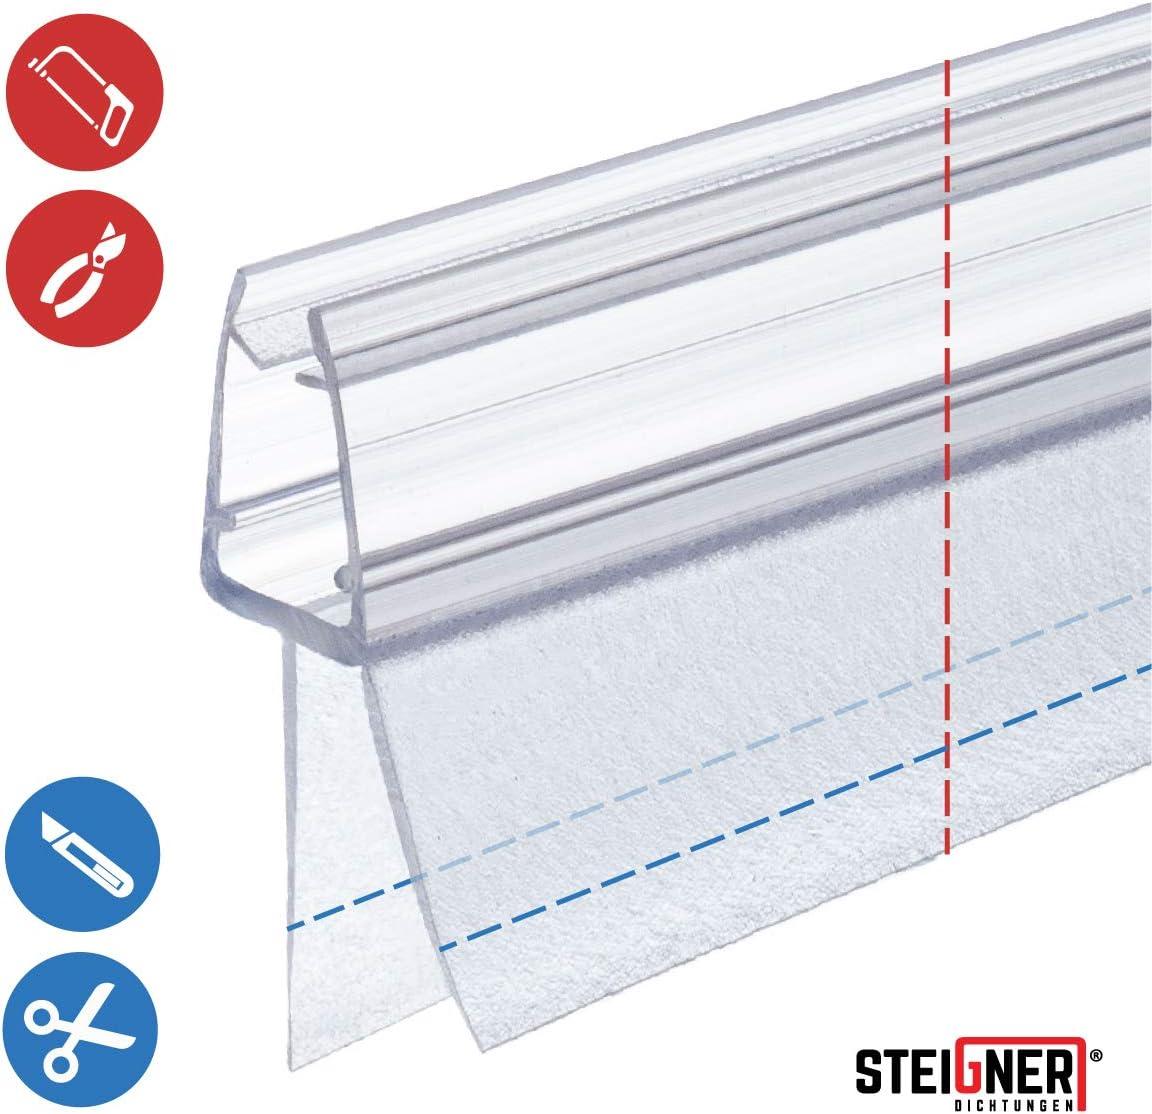 STEIGNER Duschdichtung 30cm Gerade PVC Ersatzdichtung f/ür Dusche Glasst/ärke 5//6 mm UK33-06